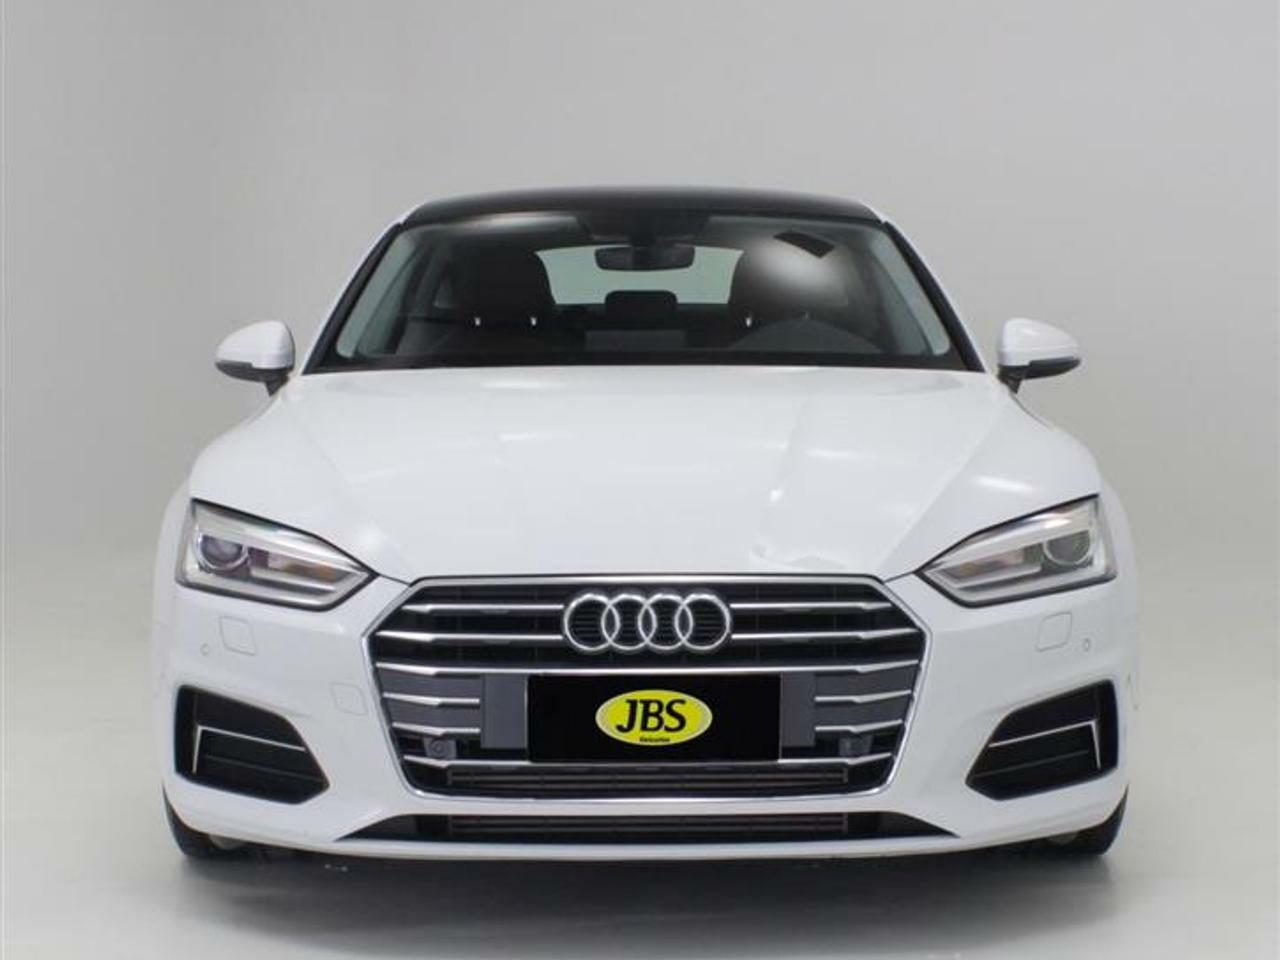 Audi A5 2 0 Sportback Prestige Plus Branco 2018 2019 Recife 1187978 Usadosbr Com